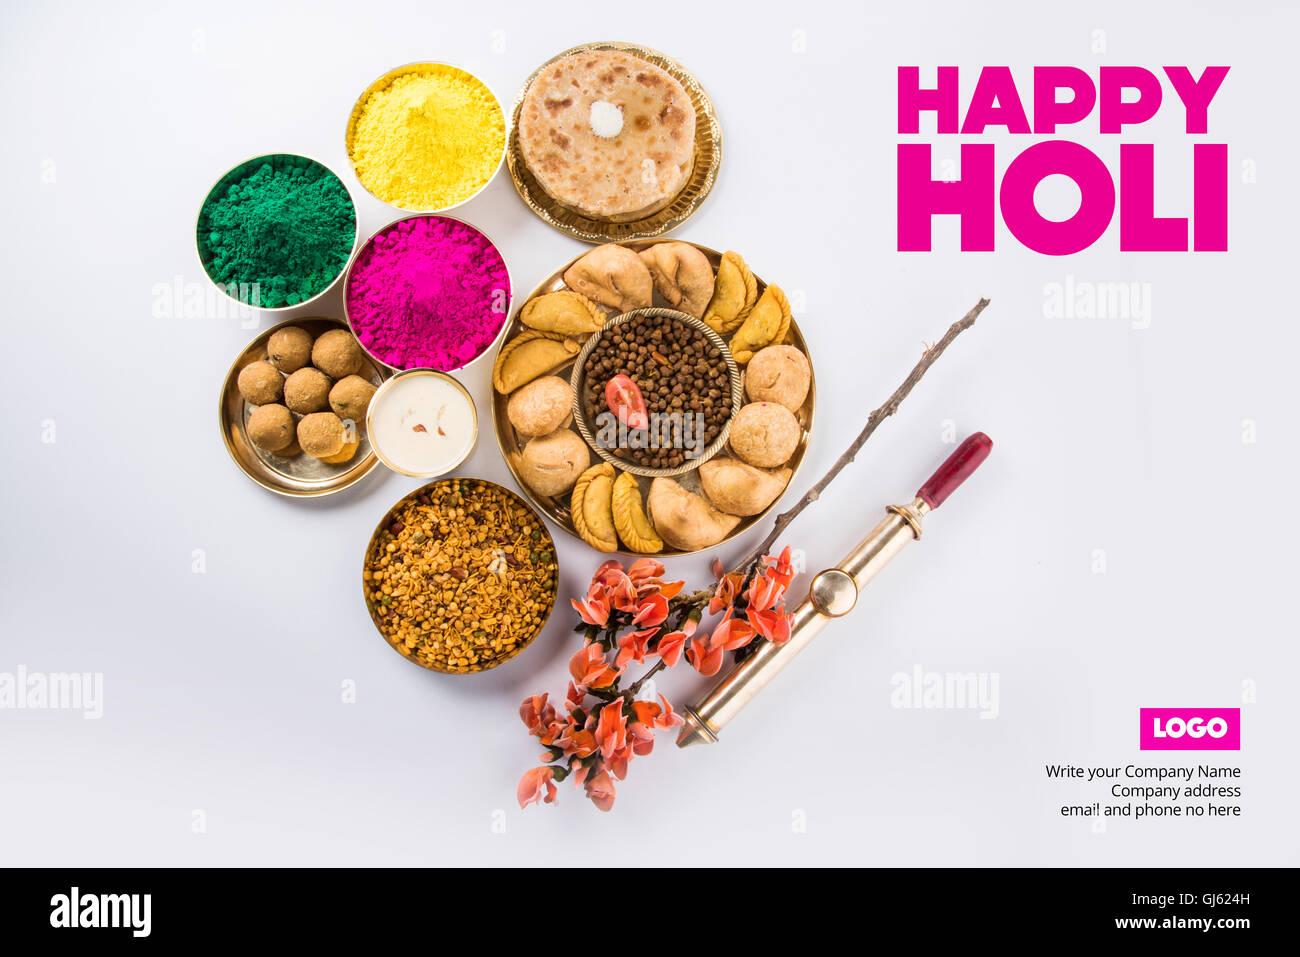 Happy holi greeting card holi wishes greeting card of indian stock happy holi greeting card holi wishes greeting card of indian festival of colours called holi seasons greetings m4hsunfo